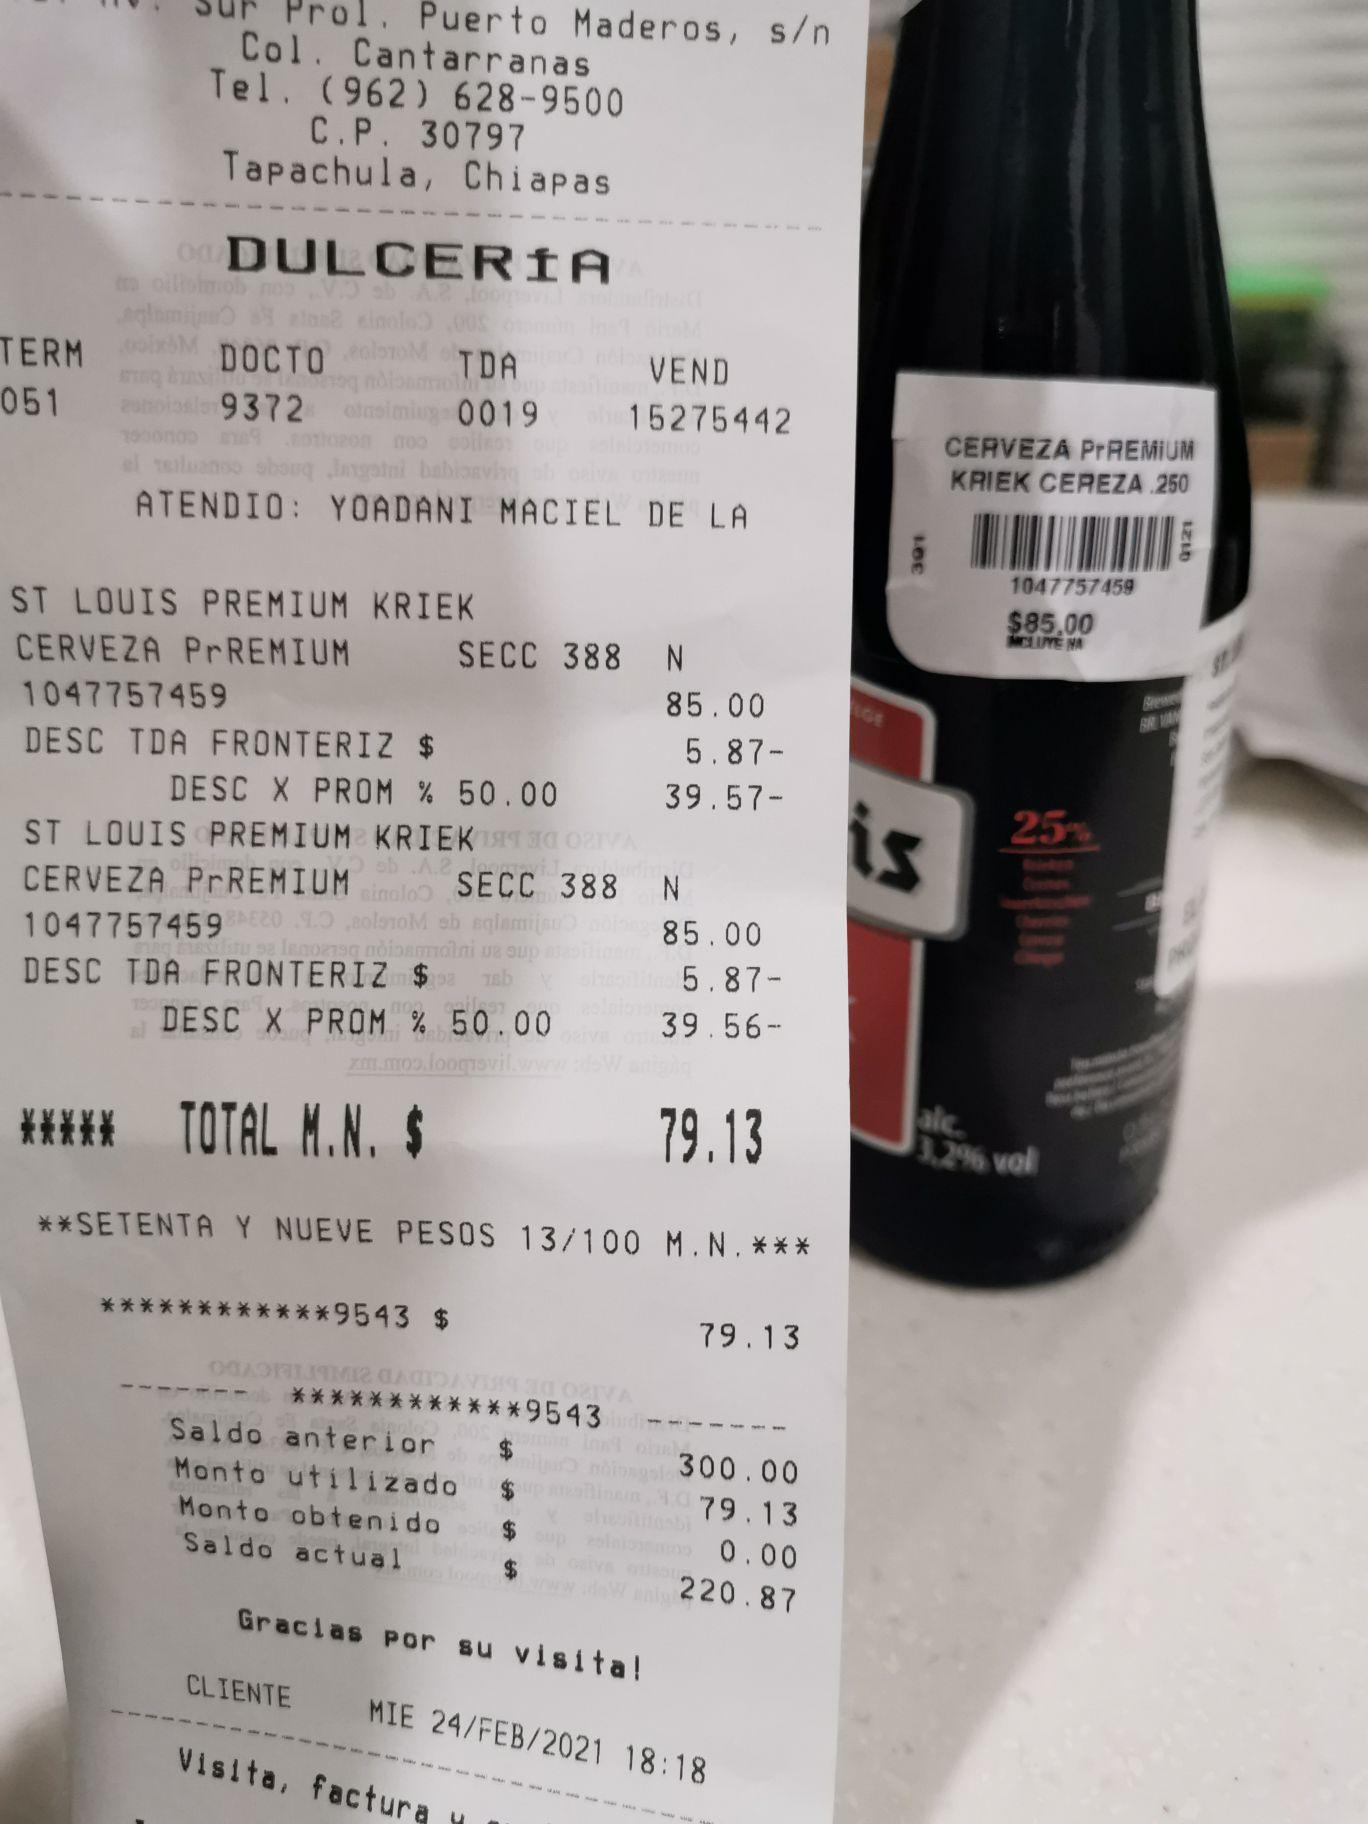 Liverpool Tapachula: 50% desc. Cerveza Kriek